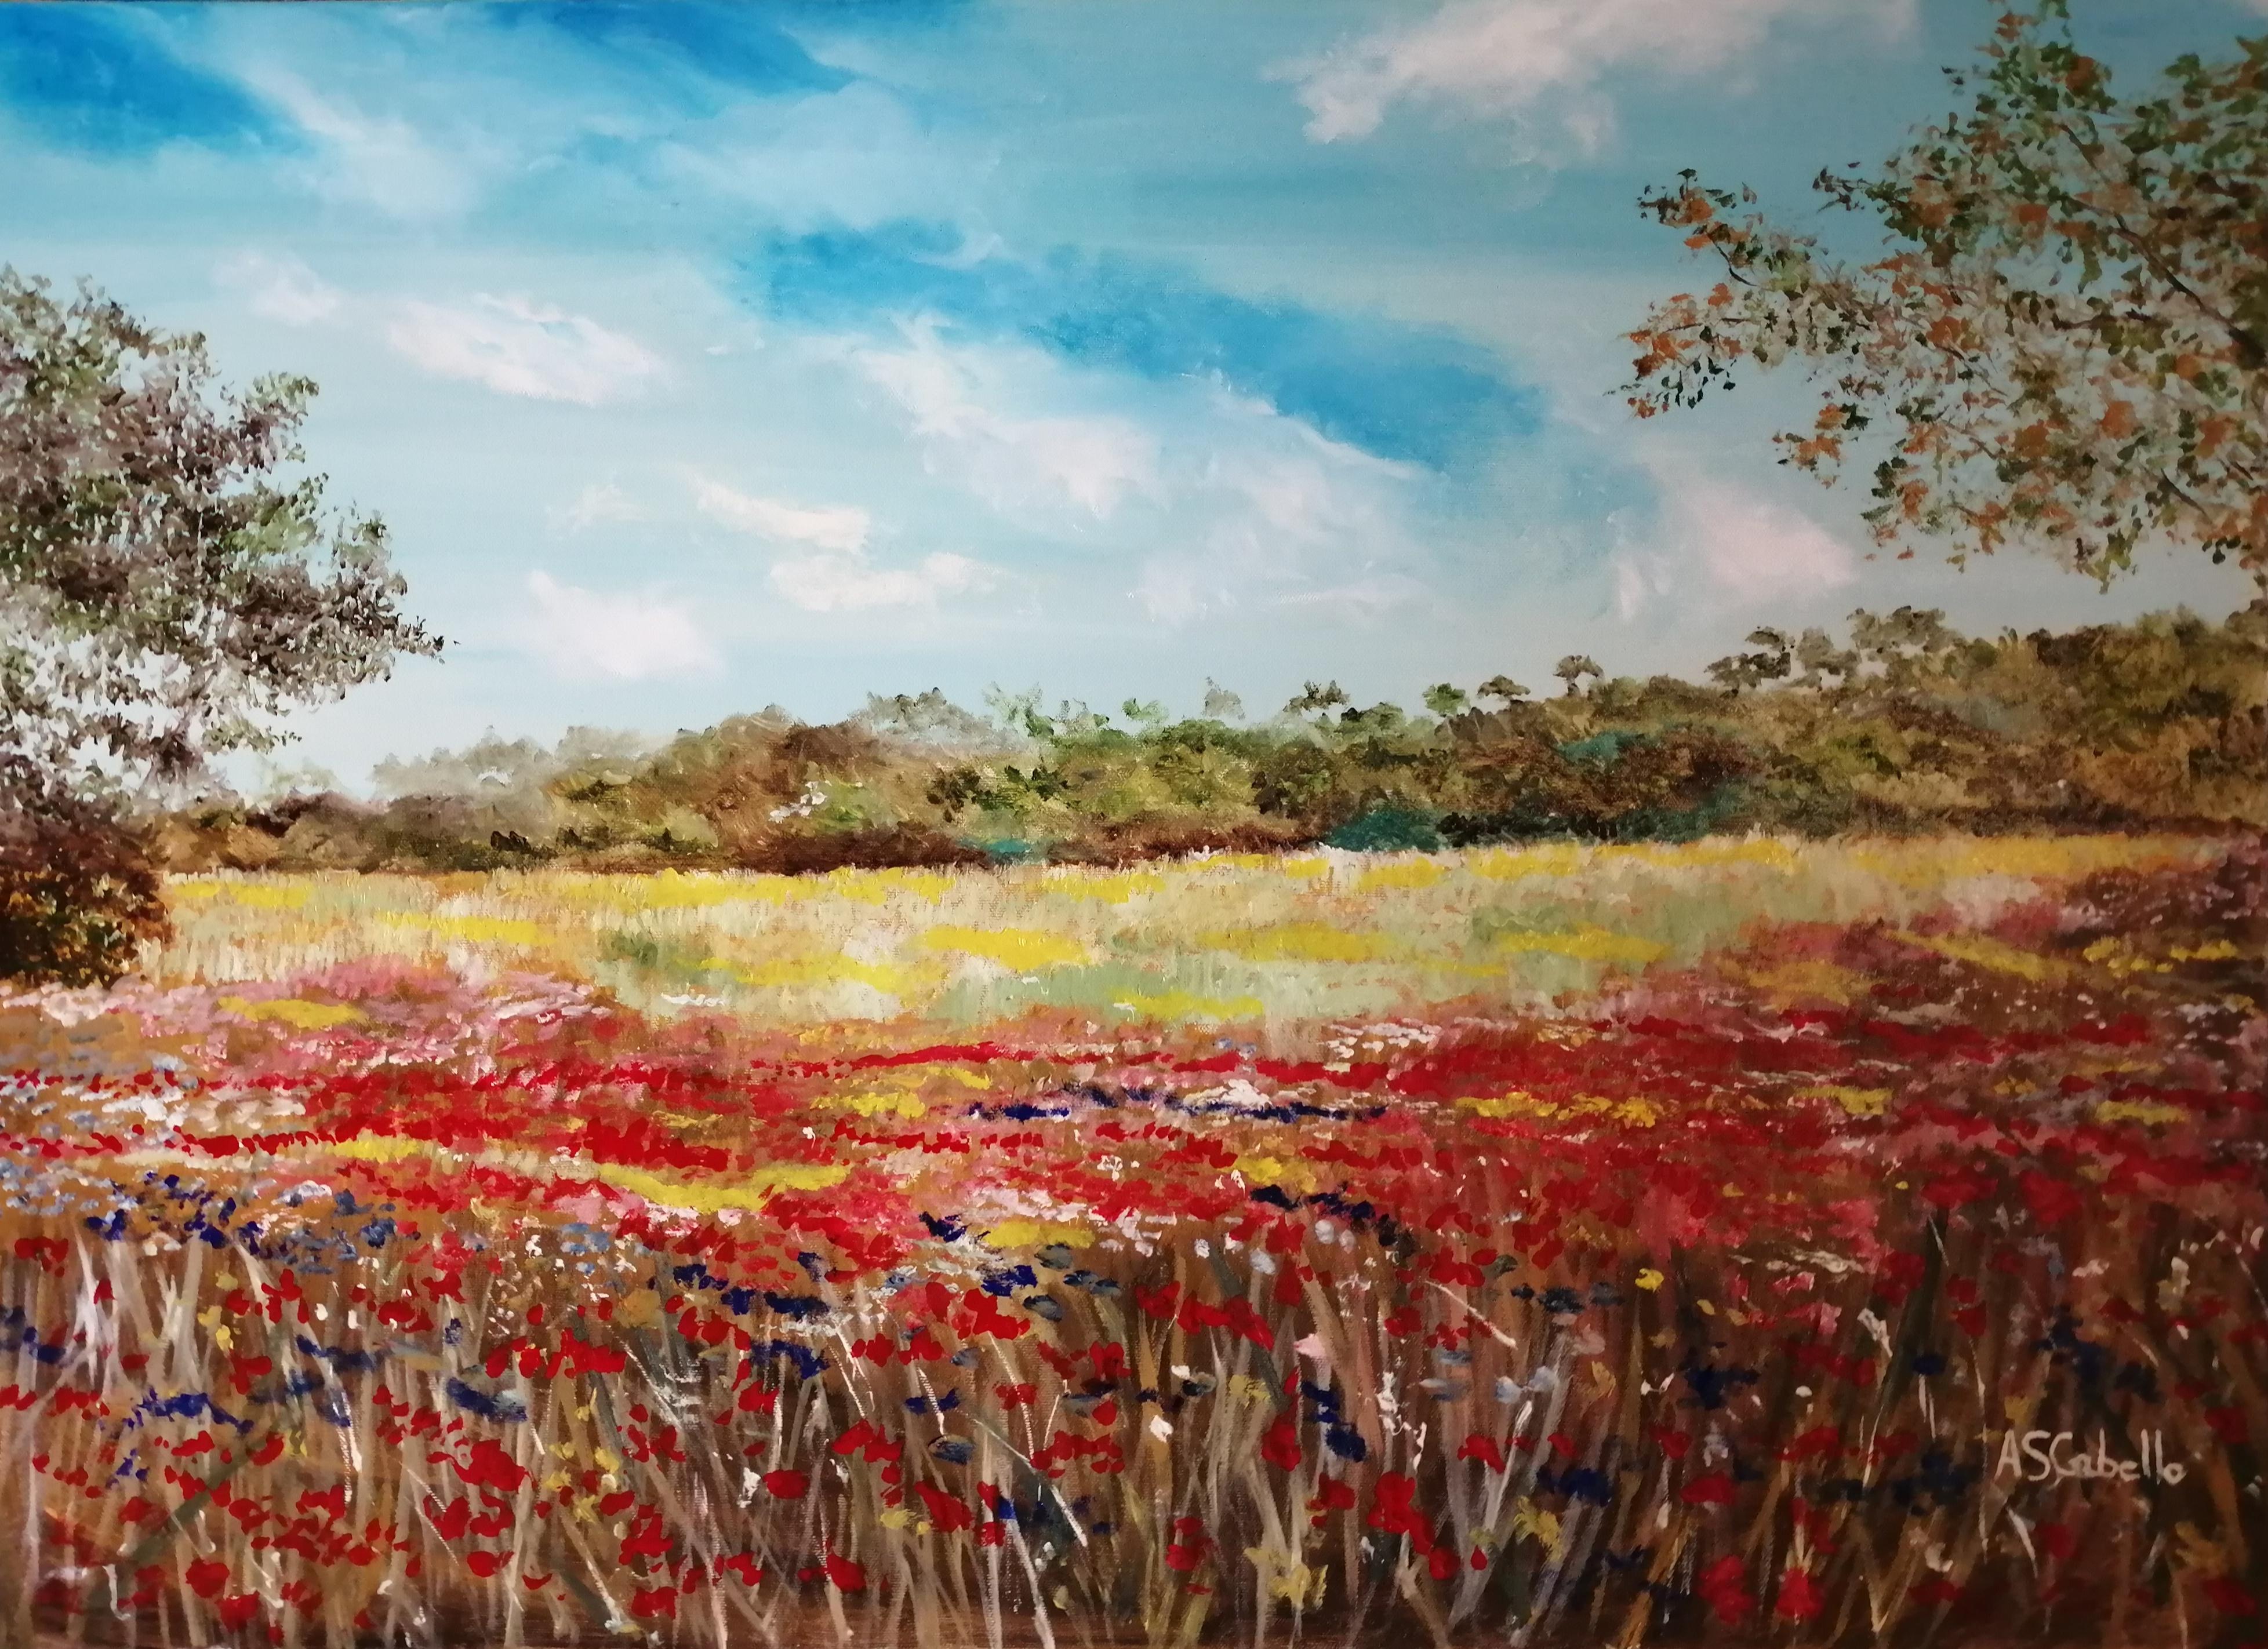 Panorámica de un campo florecido